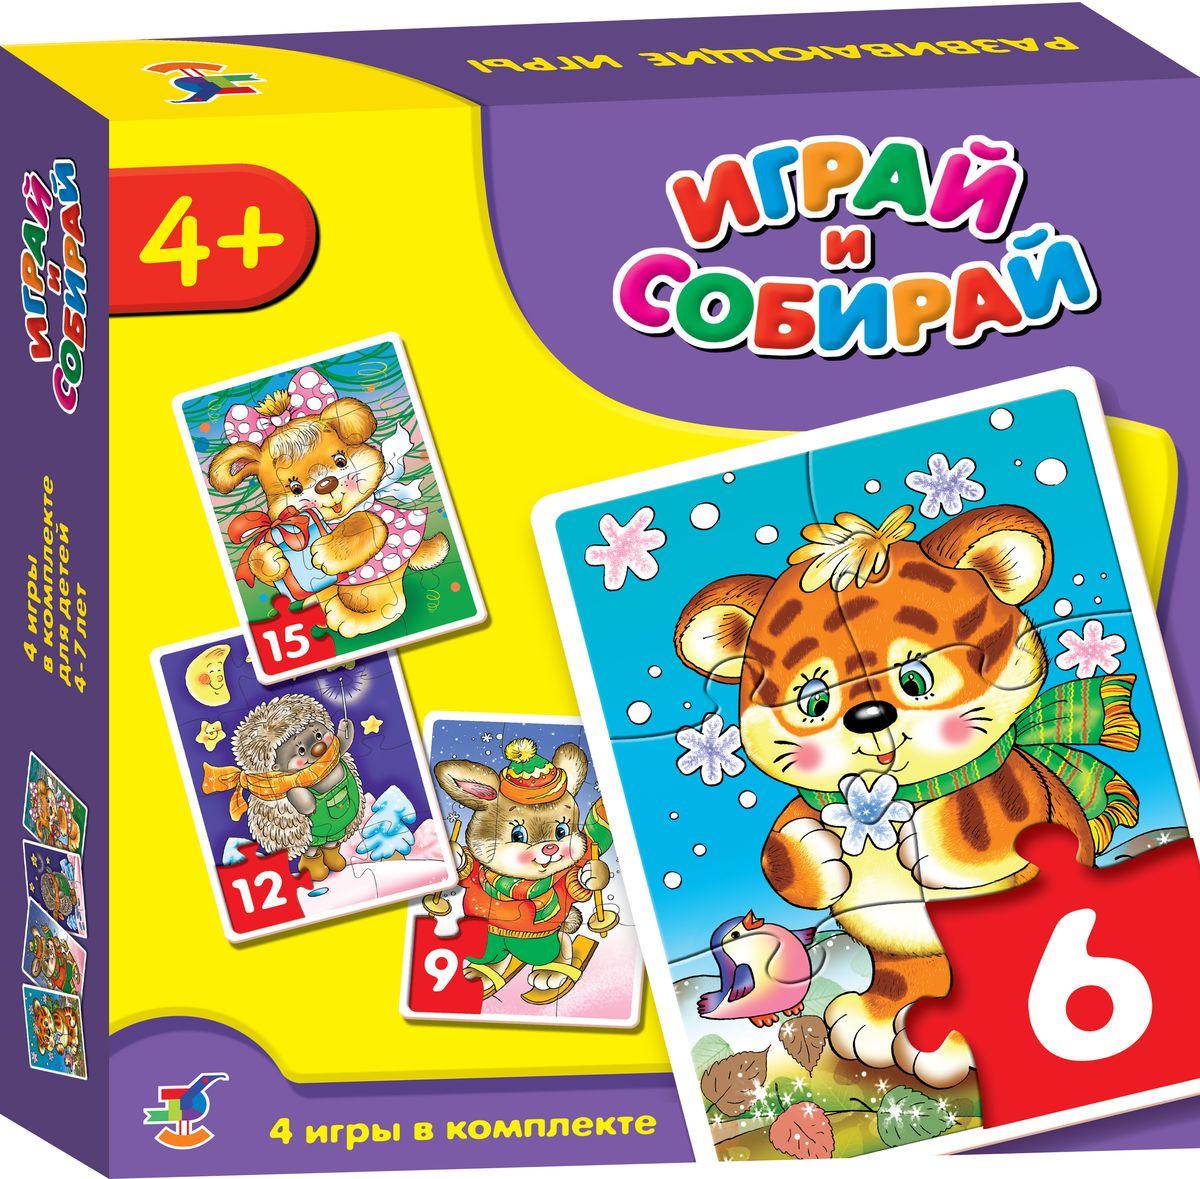 Дрофа-Медиа Пазл для малышей Играй и собирай 4 в 1 2945 дрофа медиа пазл для малышей играй и собирай 4 в 1 2938